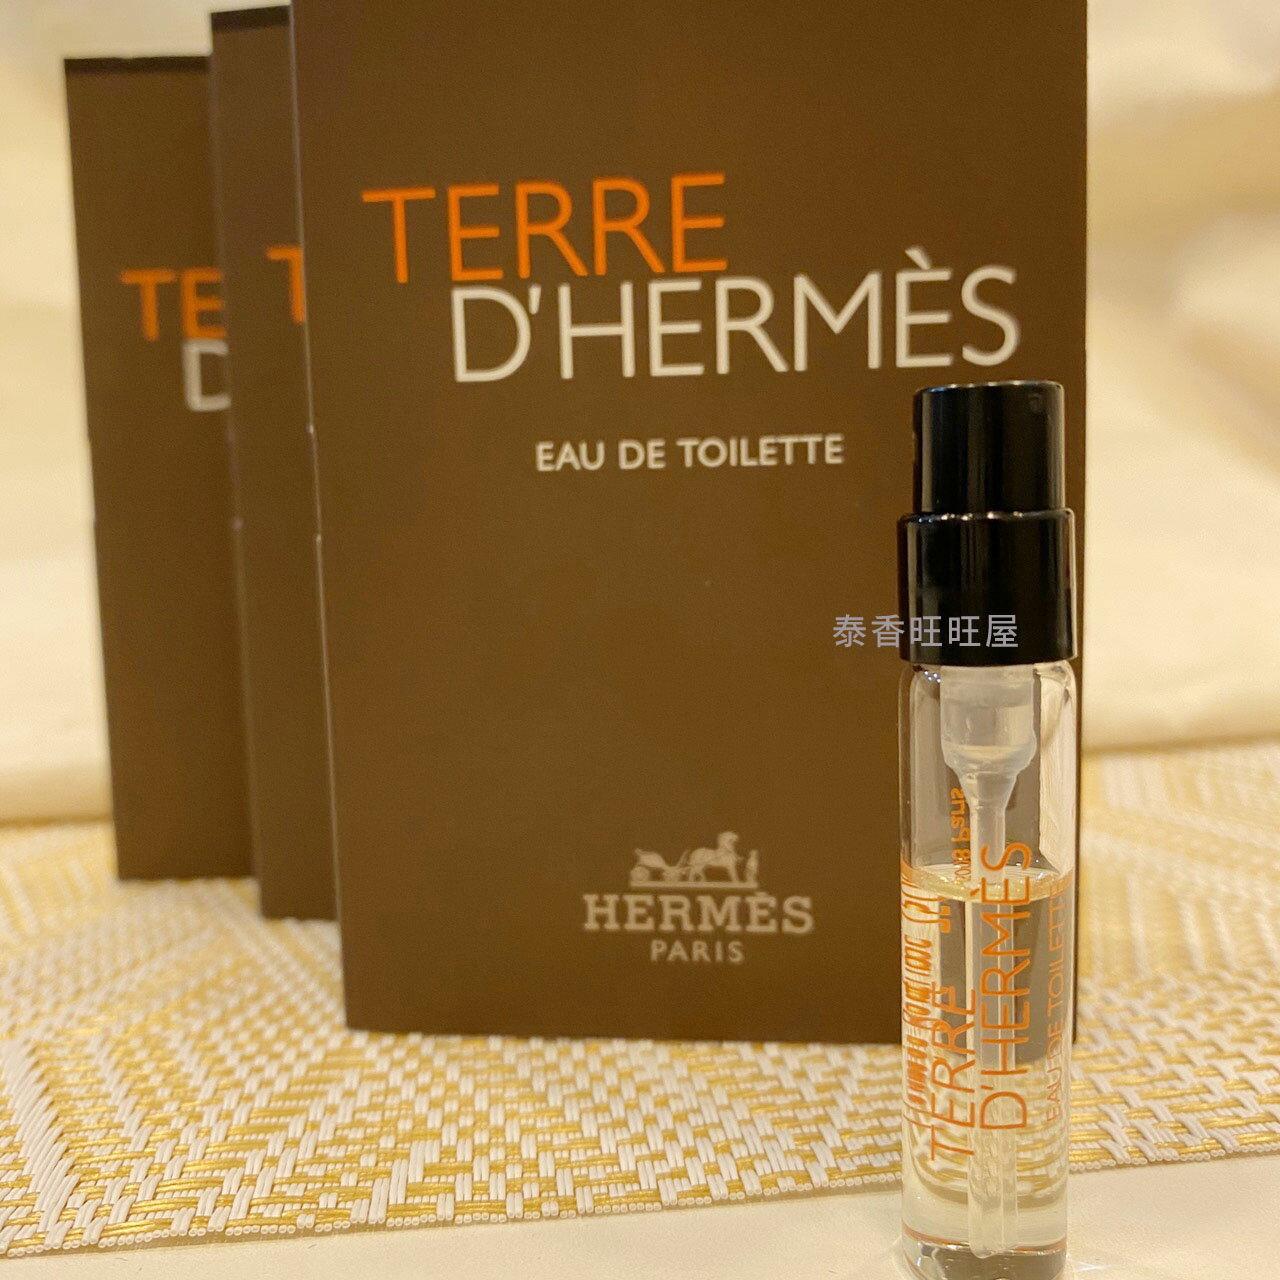 Hermes 愛馬仕大地極致清新淡香水 / Terre d'Hermes / 針管 / 試管 / 2ml*3 2